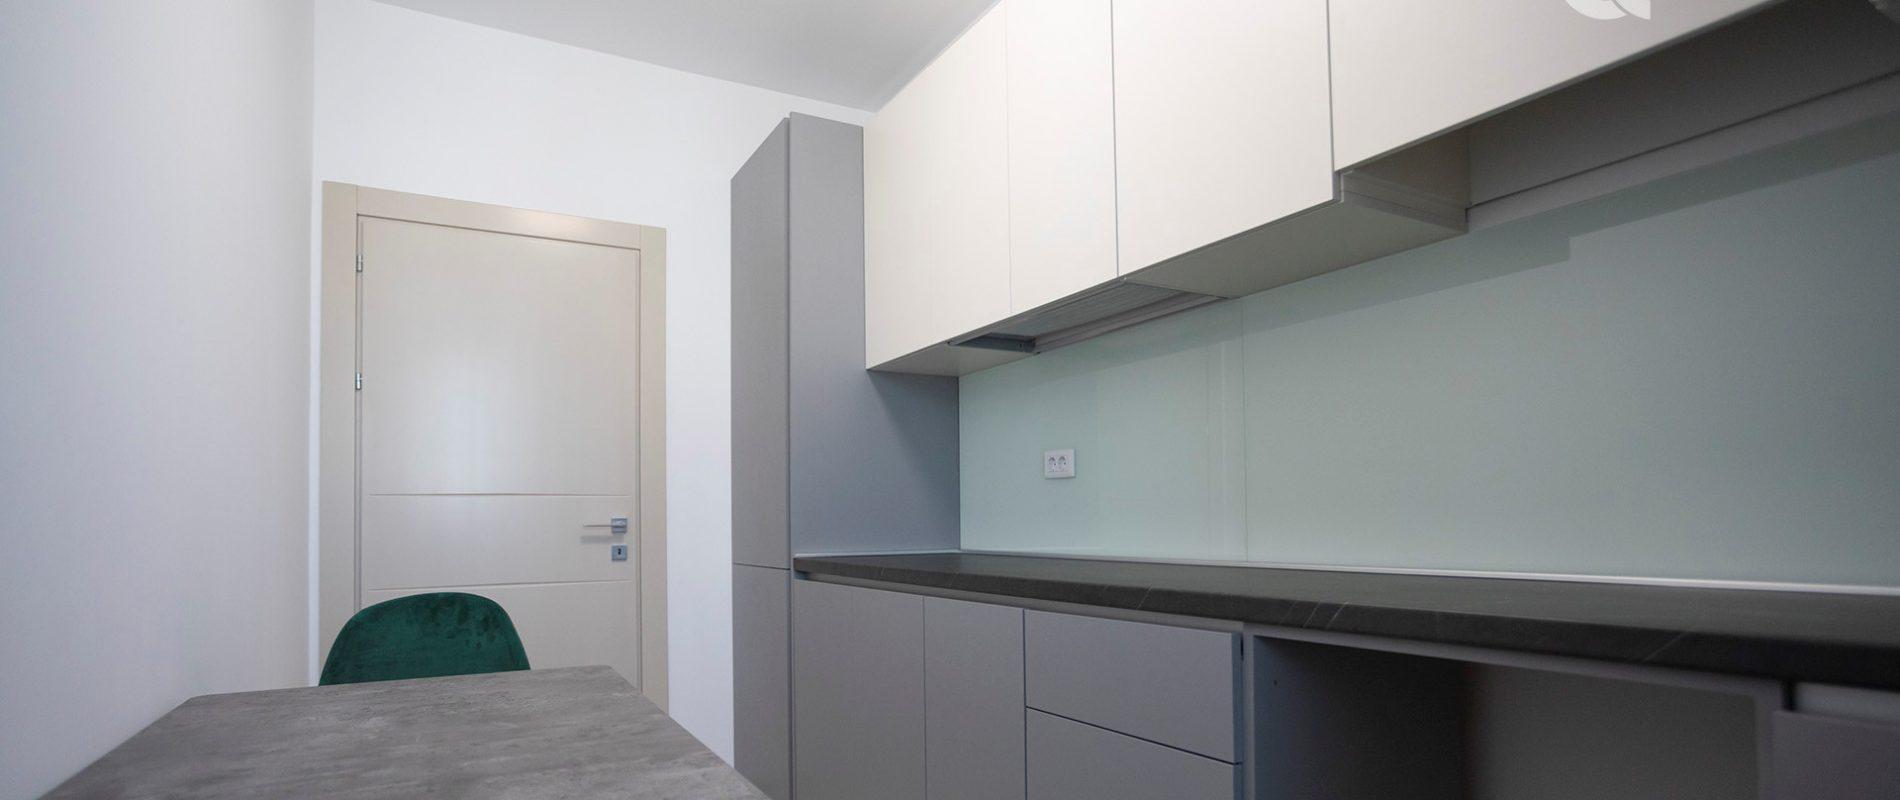 q-residence-apartament-cu-o-camera-mobilier-modern-bucatarie-09